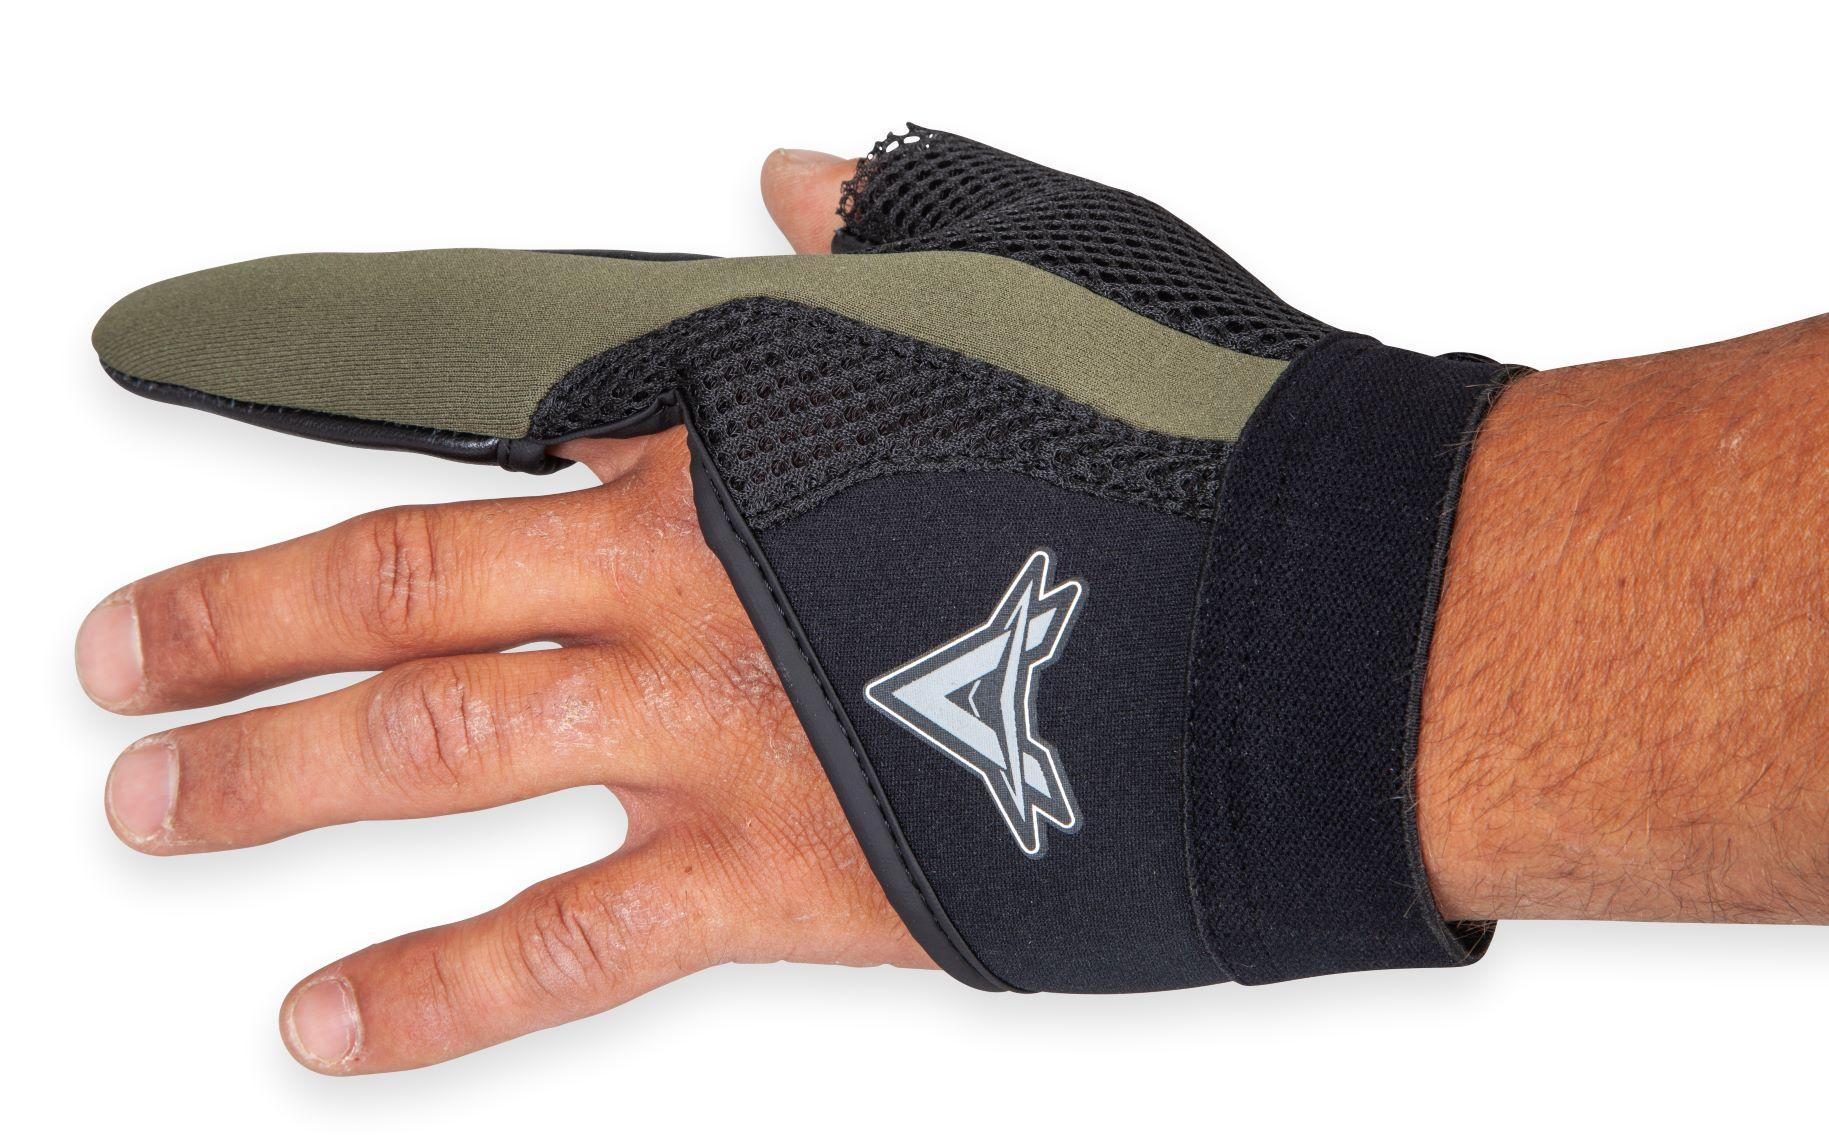 Anaconda rukavice Profi Casting Glove, levá, vel. L